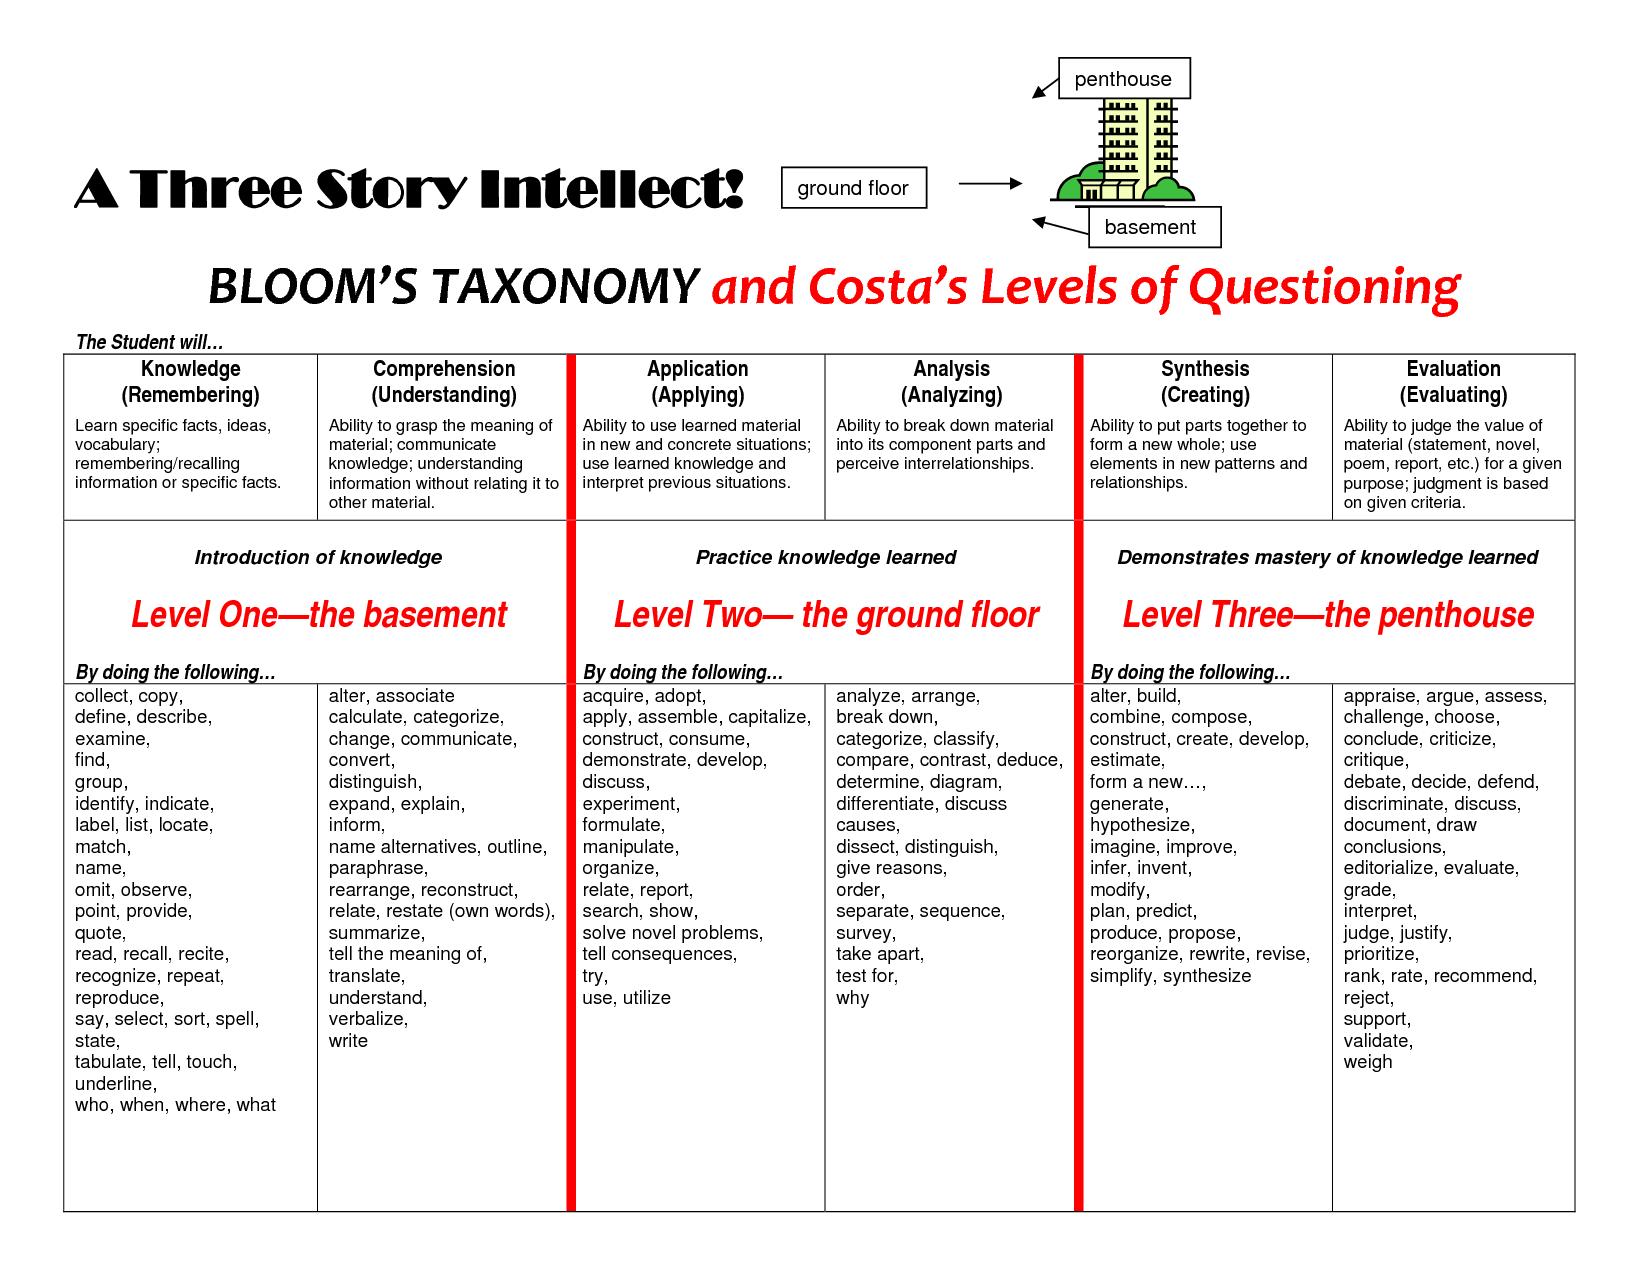 Blooms Taxonomy Center For Teaching Vanderbilt Three